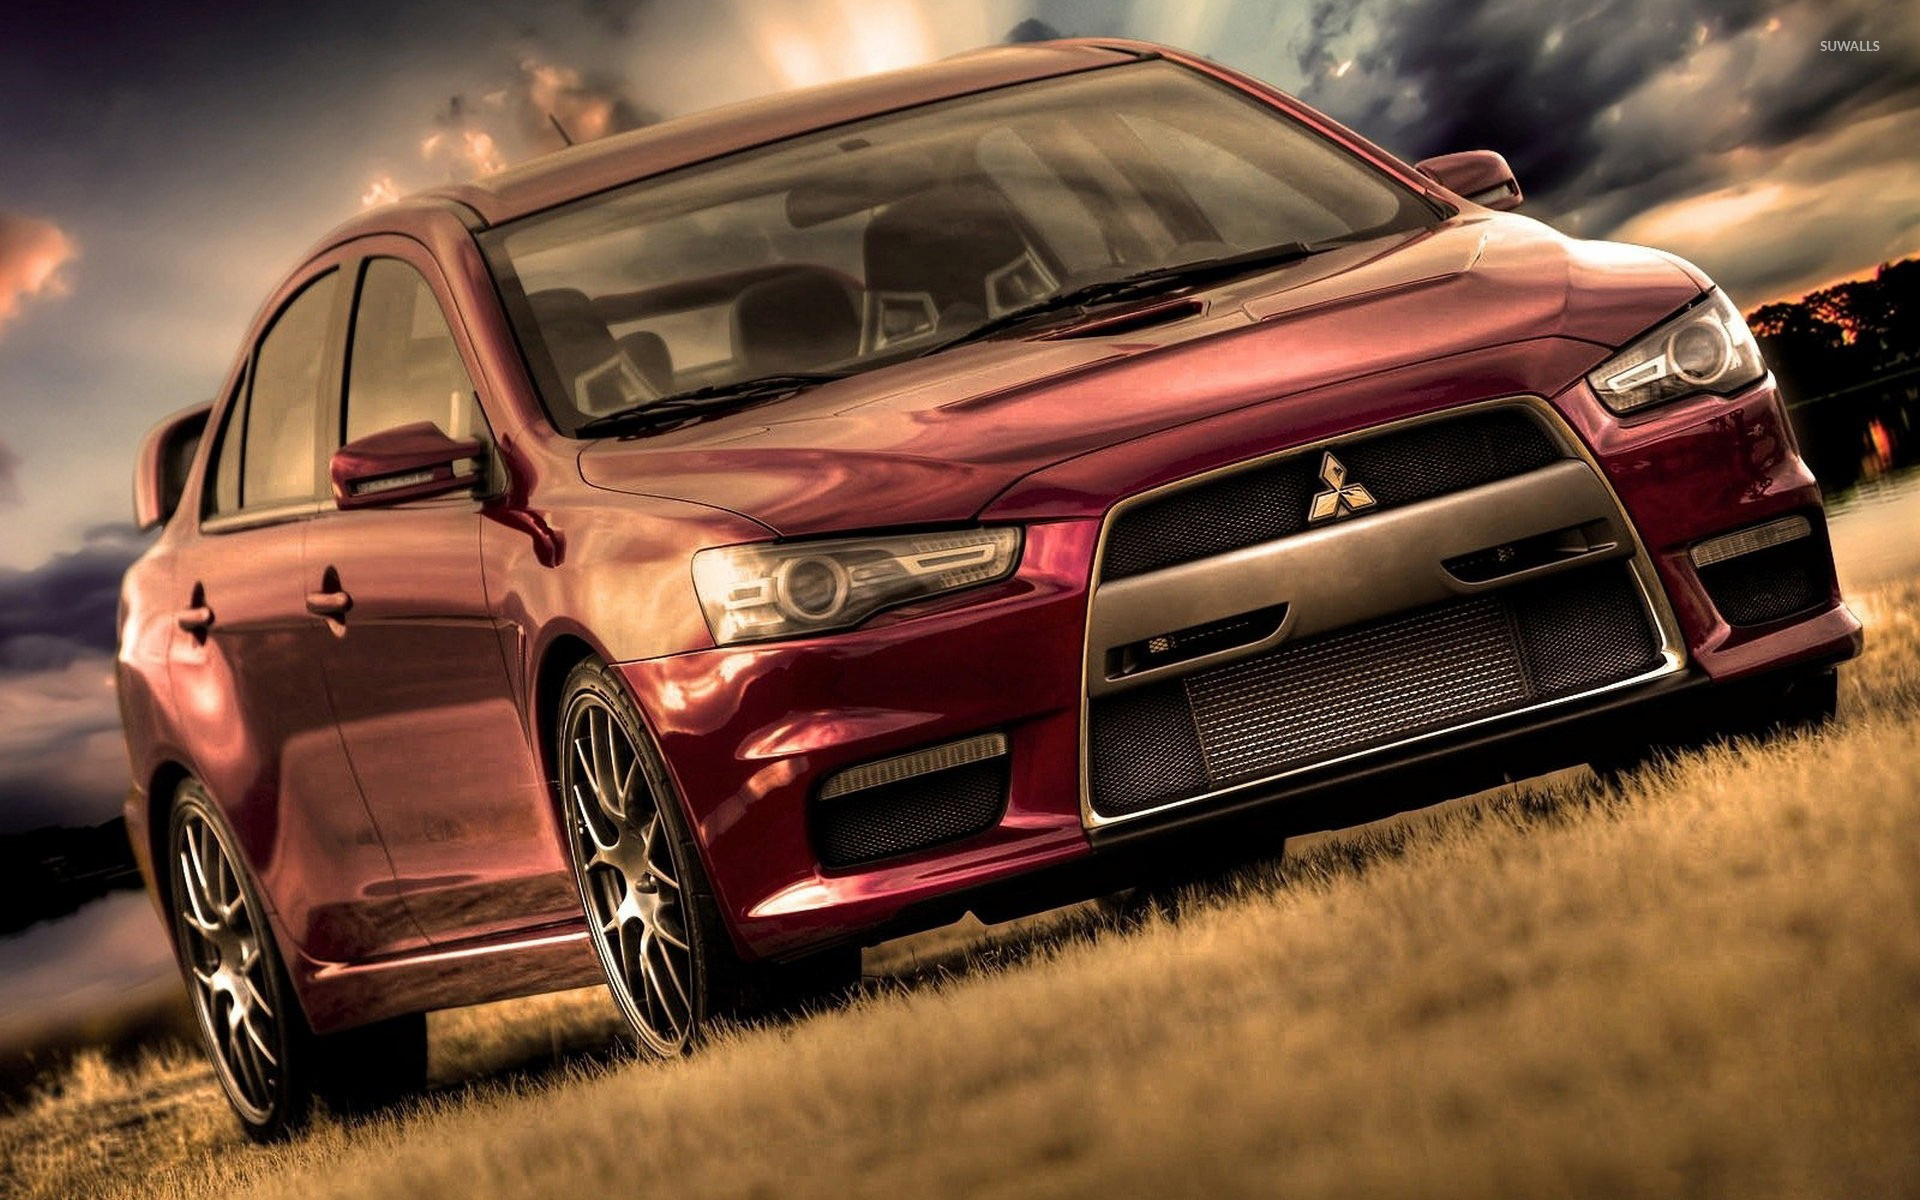 Red Mitsubishi Lancer Evolution Wallpaper Car Wallpapers 49316